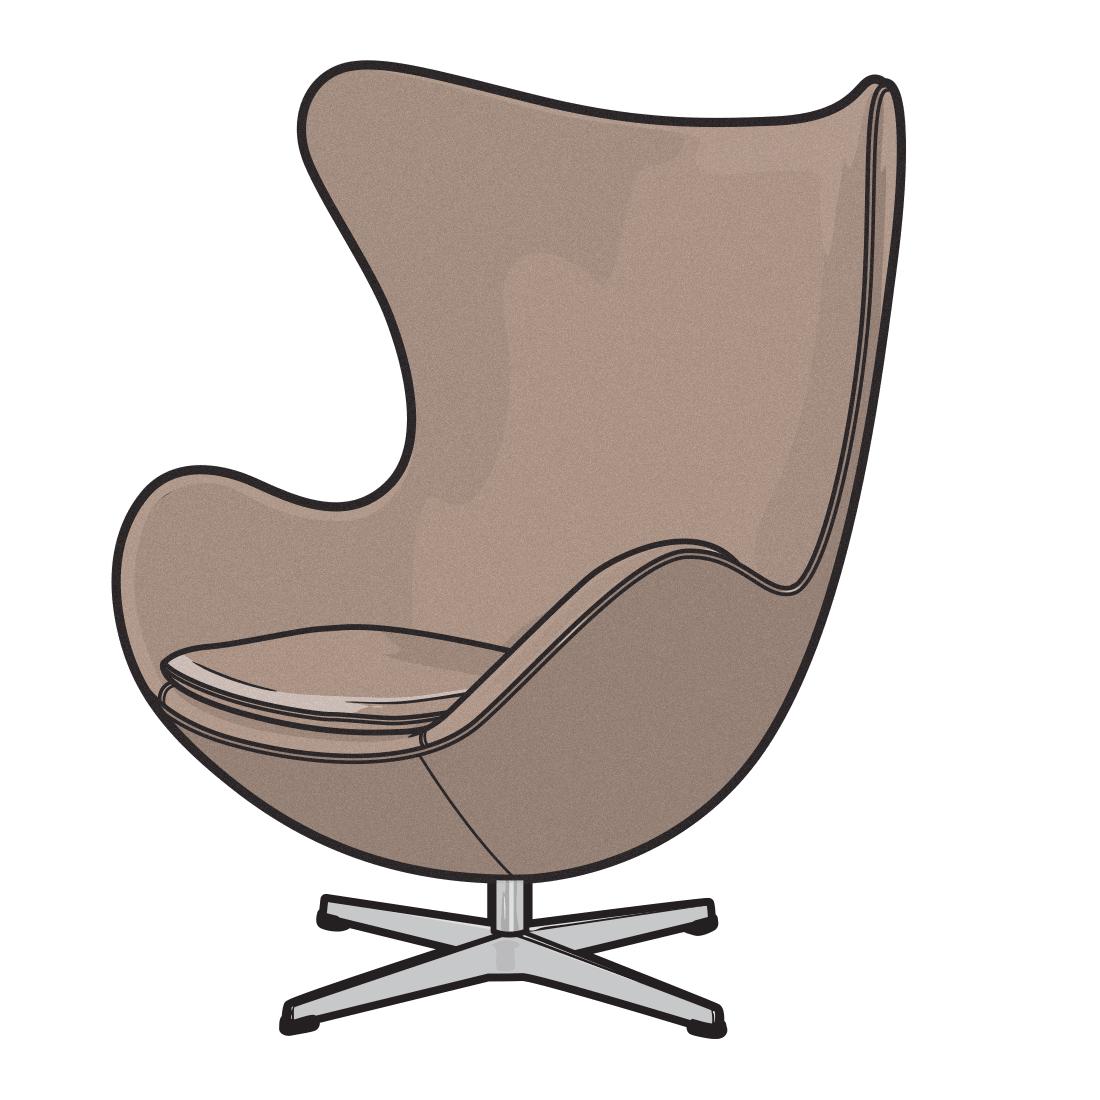 vector royalty free download Furniture illustration